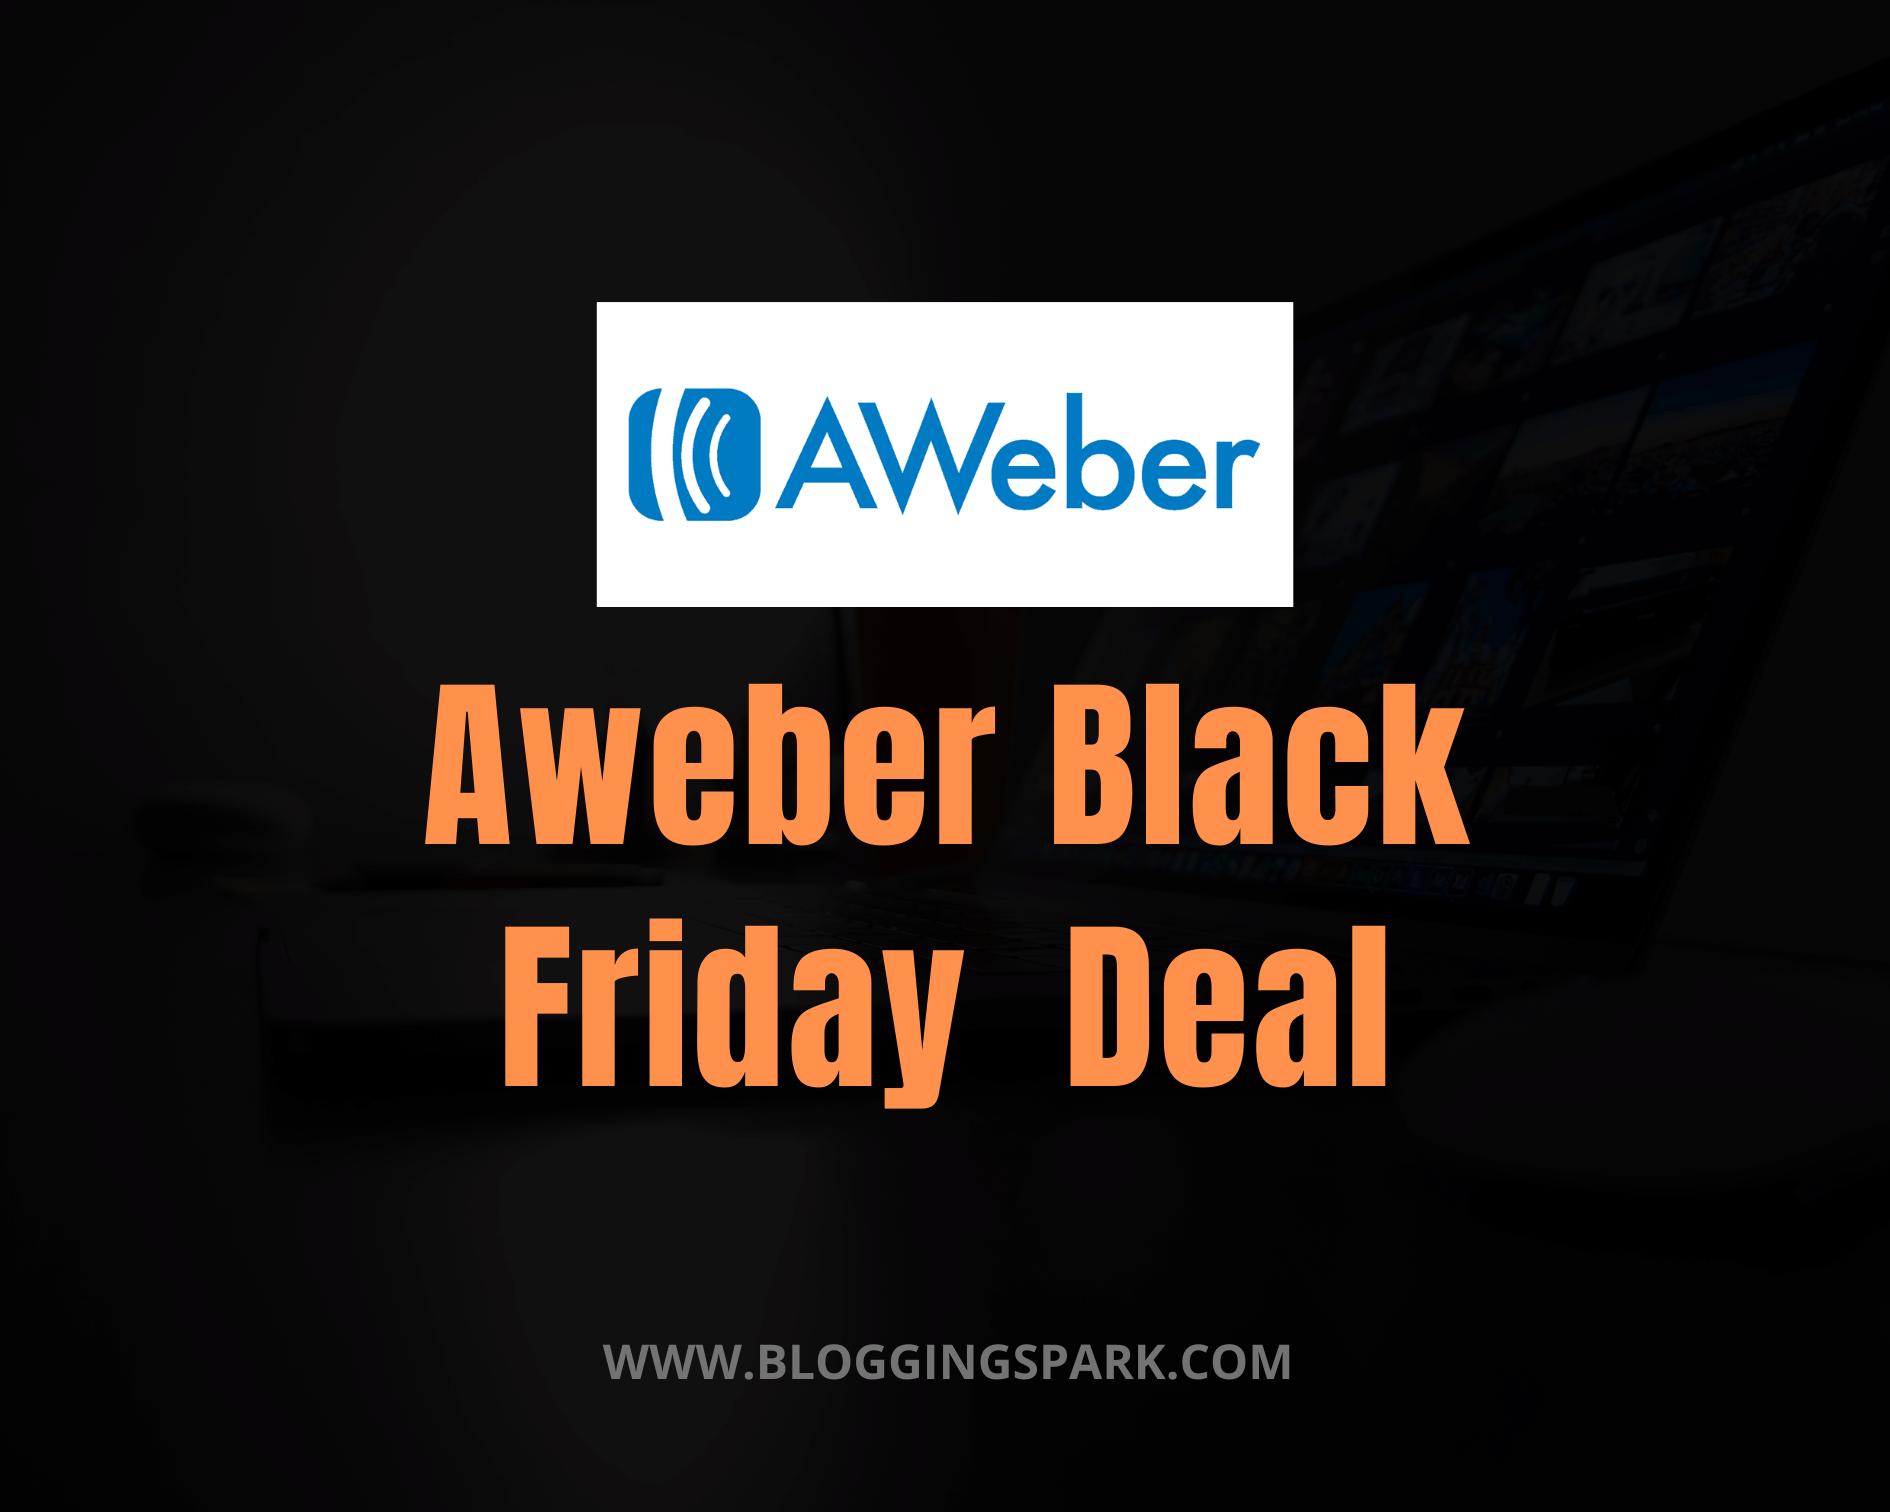 Aweber Black Friday 2020 Deal